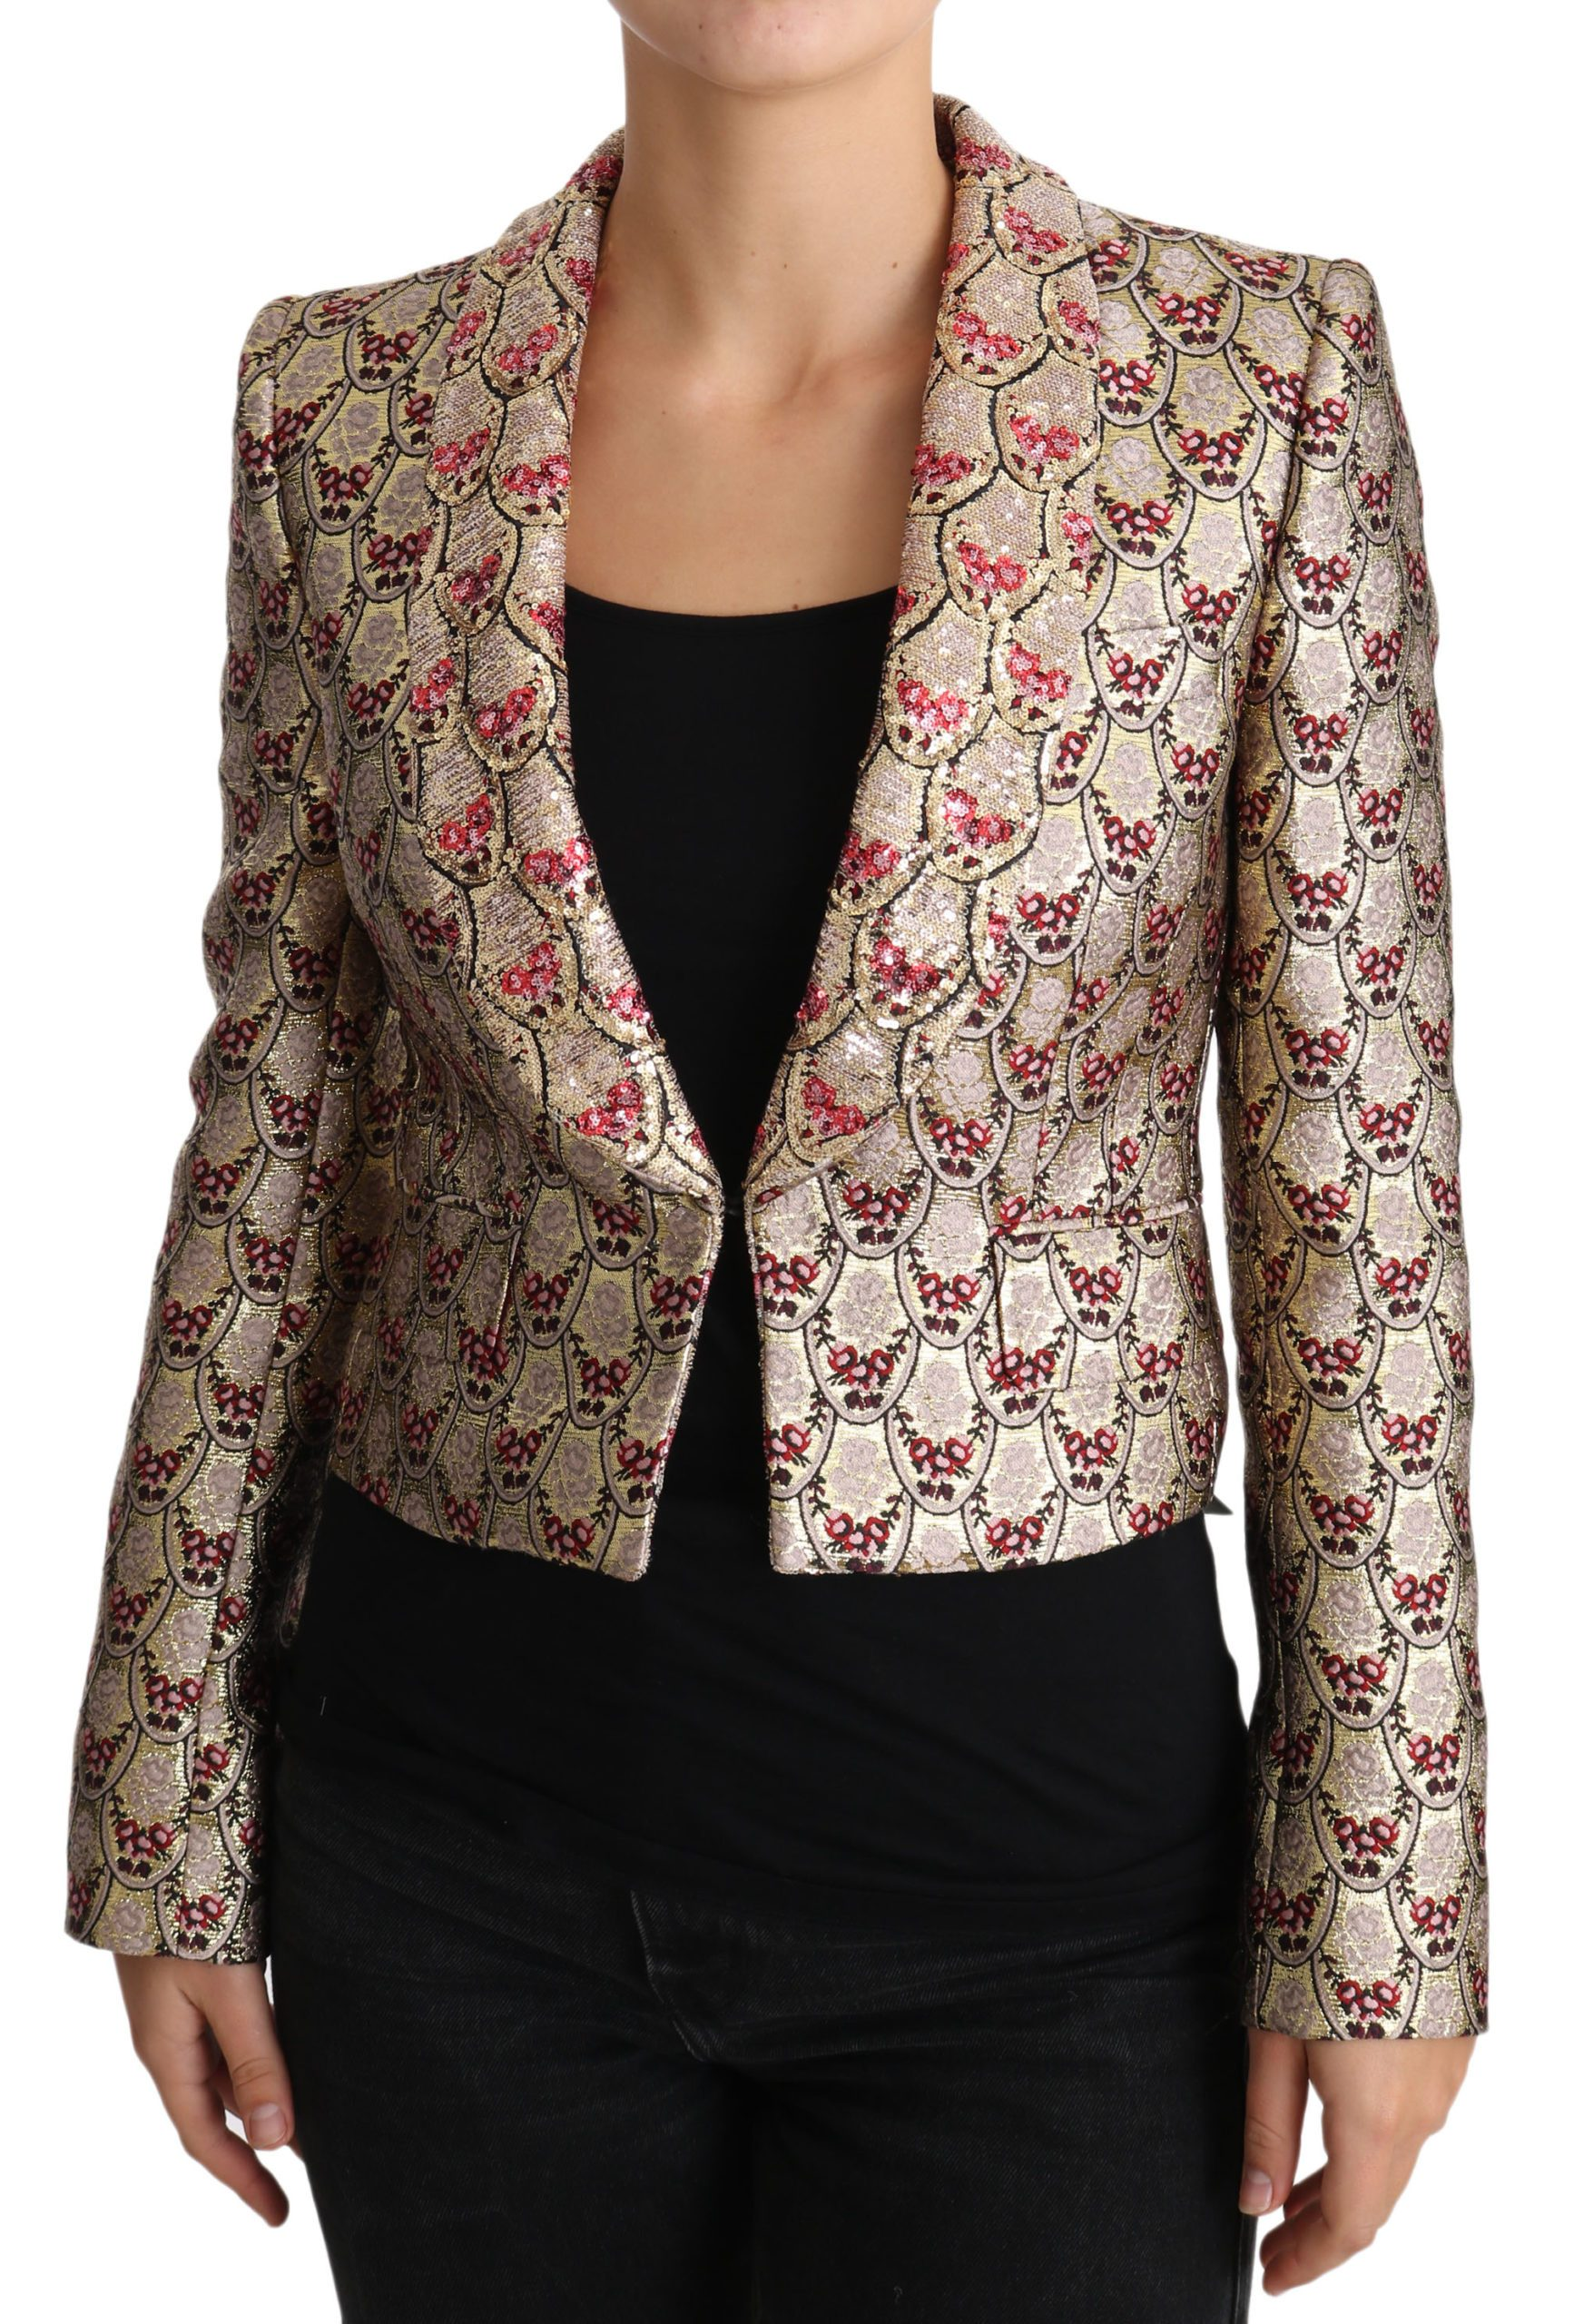 Dolce & Gabbana Women's Floral Sequined Blazer Jacket Gold JKT2420 - IT38 XS